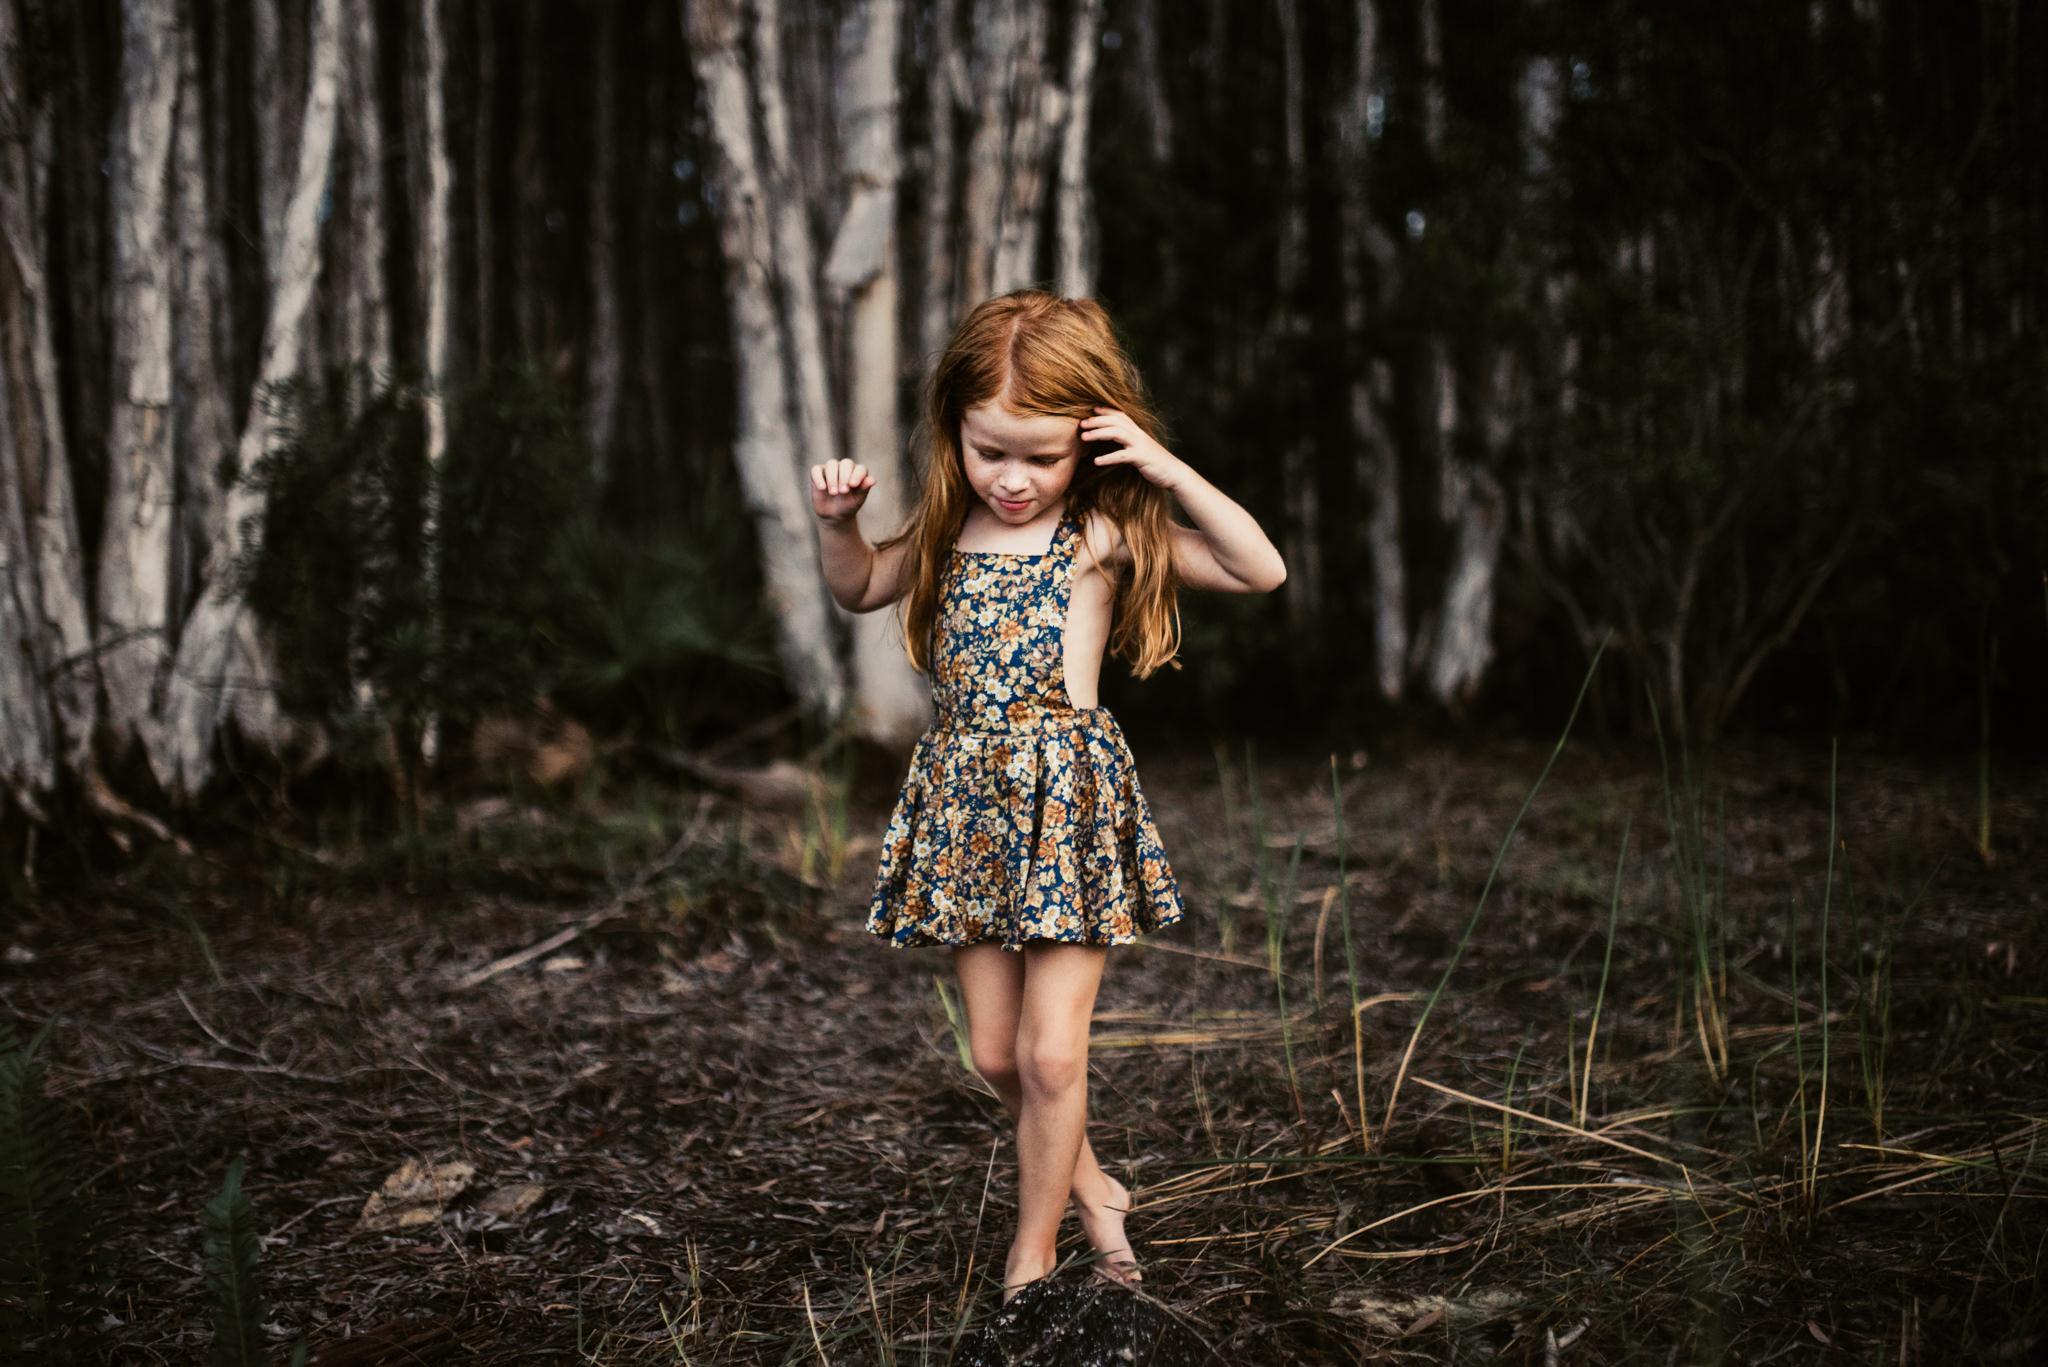 twyla jones photography - treasure coast florida - childrens adventure clothing commercial shoot--55.jpg